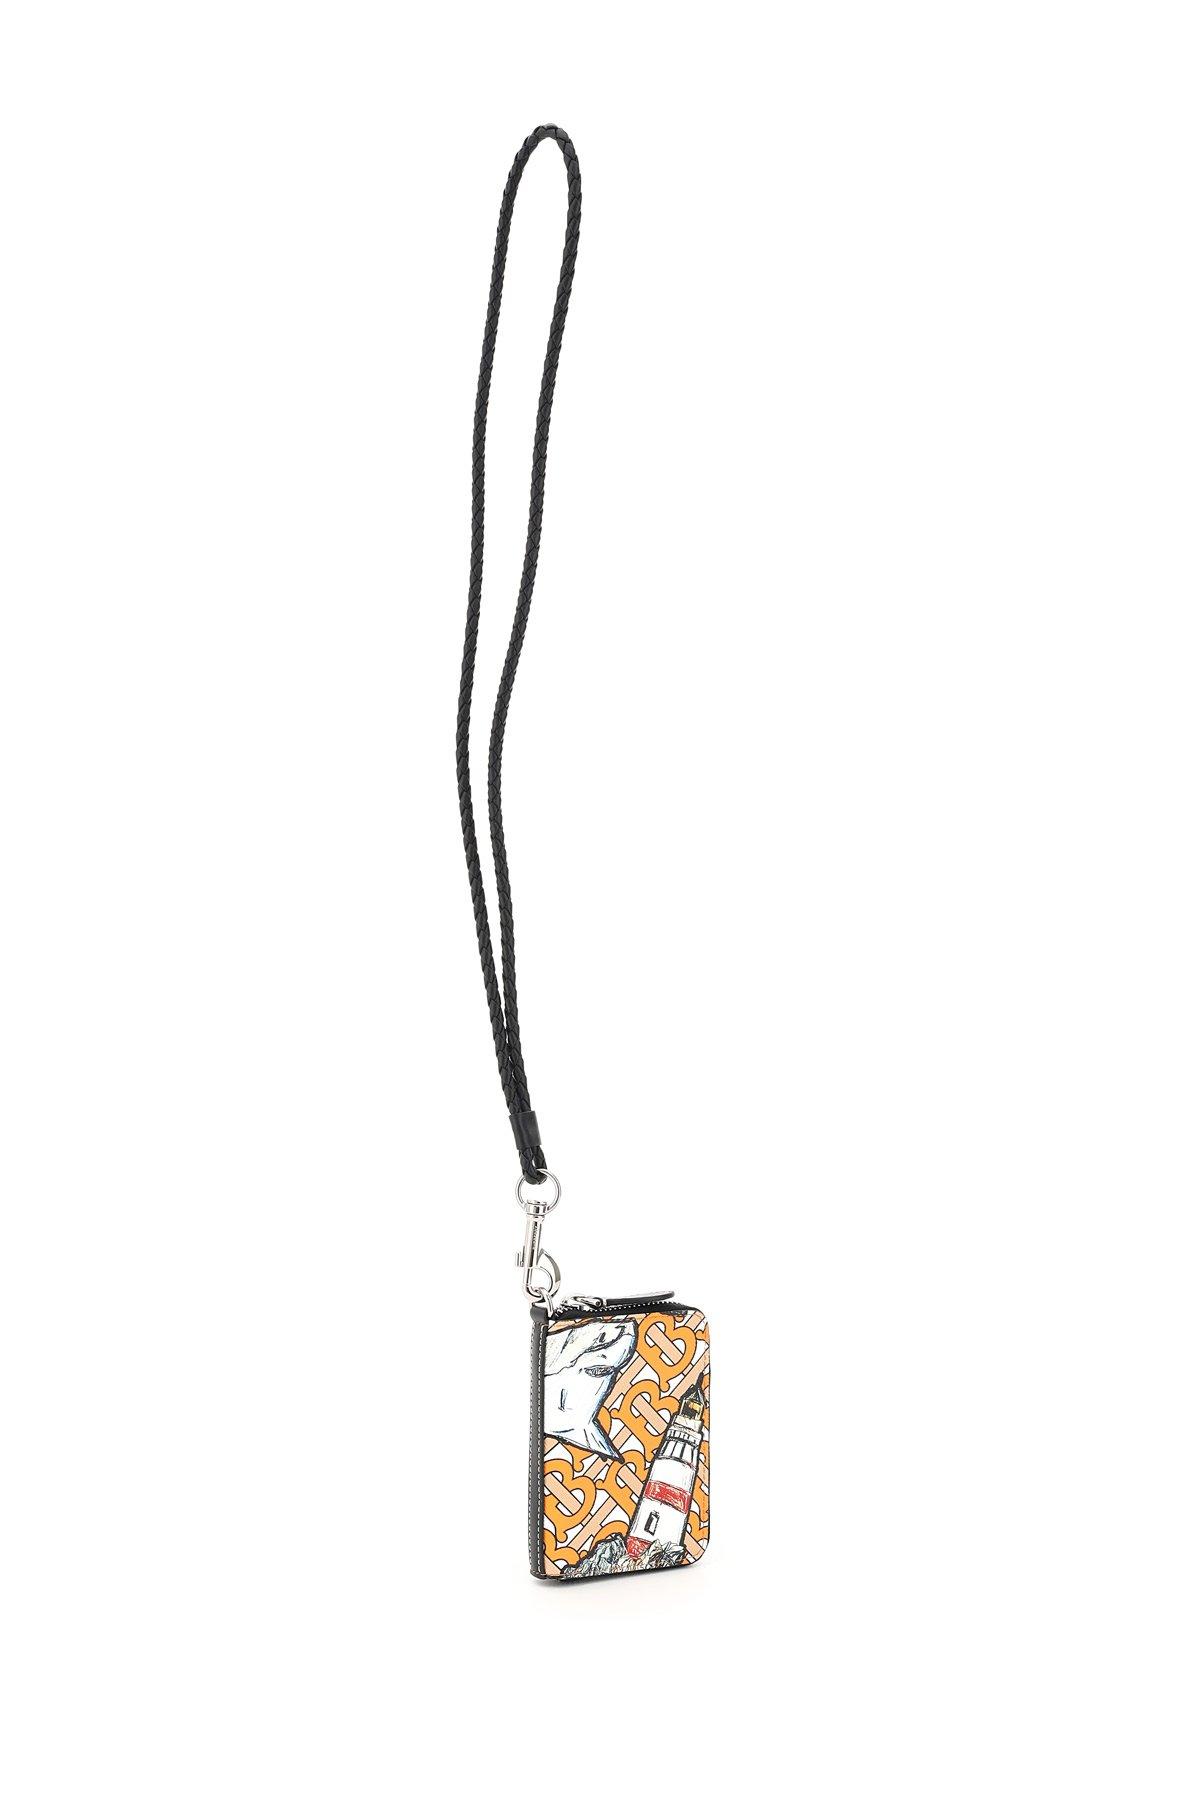 Burberry portafoglio necklace ferris stampa marina tb